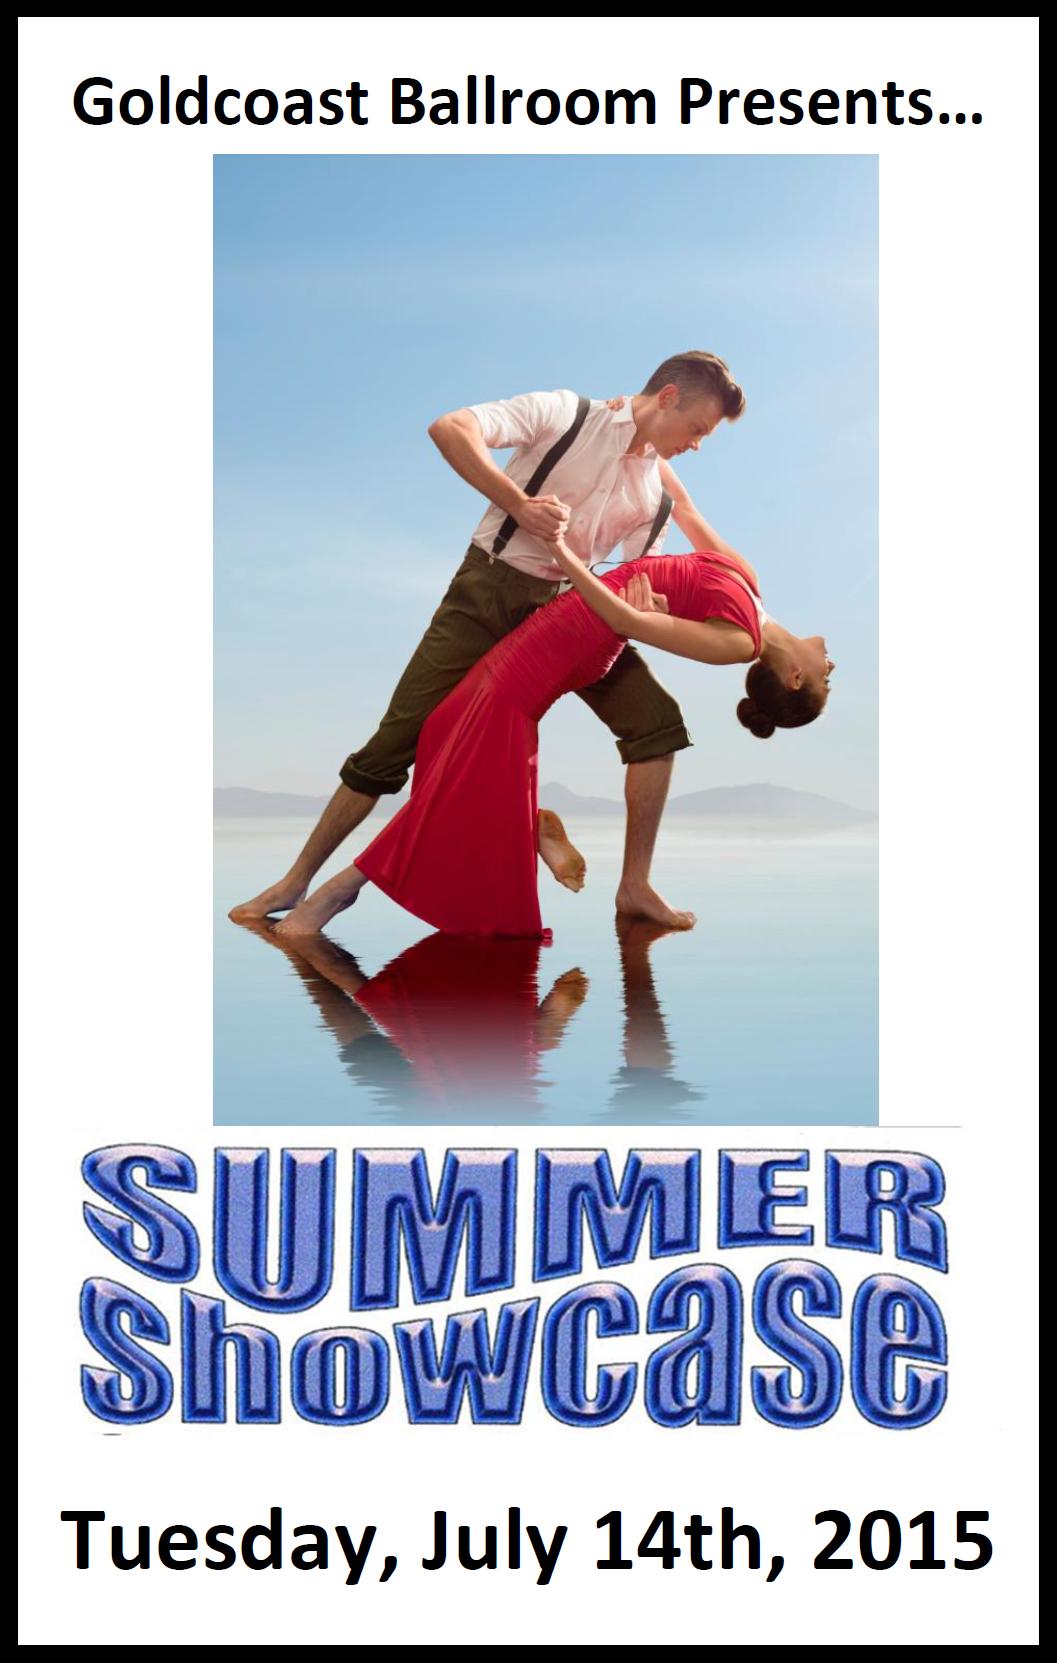 Goldcoast Ballroom Presents Summer Showcase - July 14, 2015